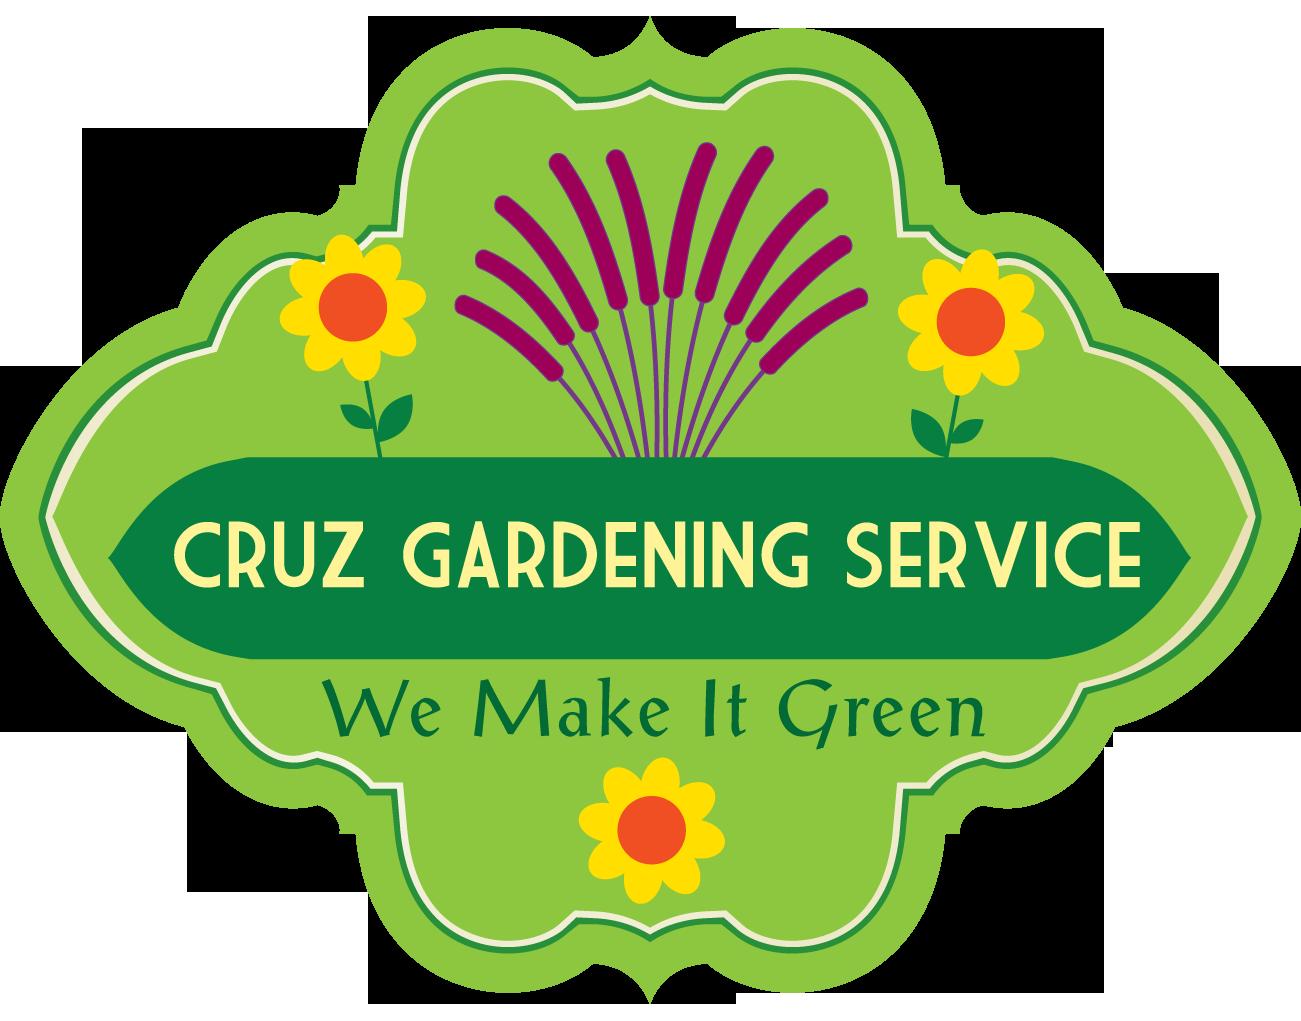 Cruz Gardening Service